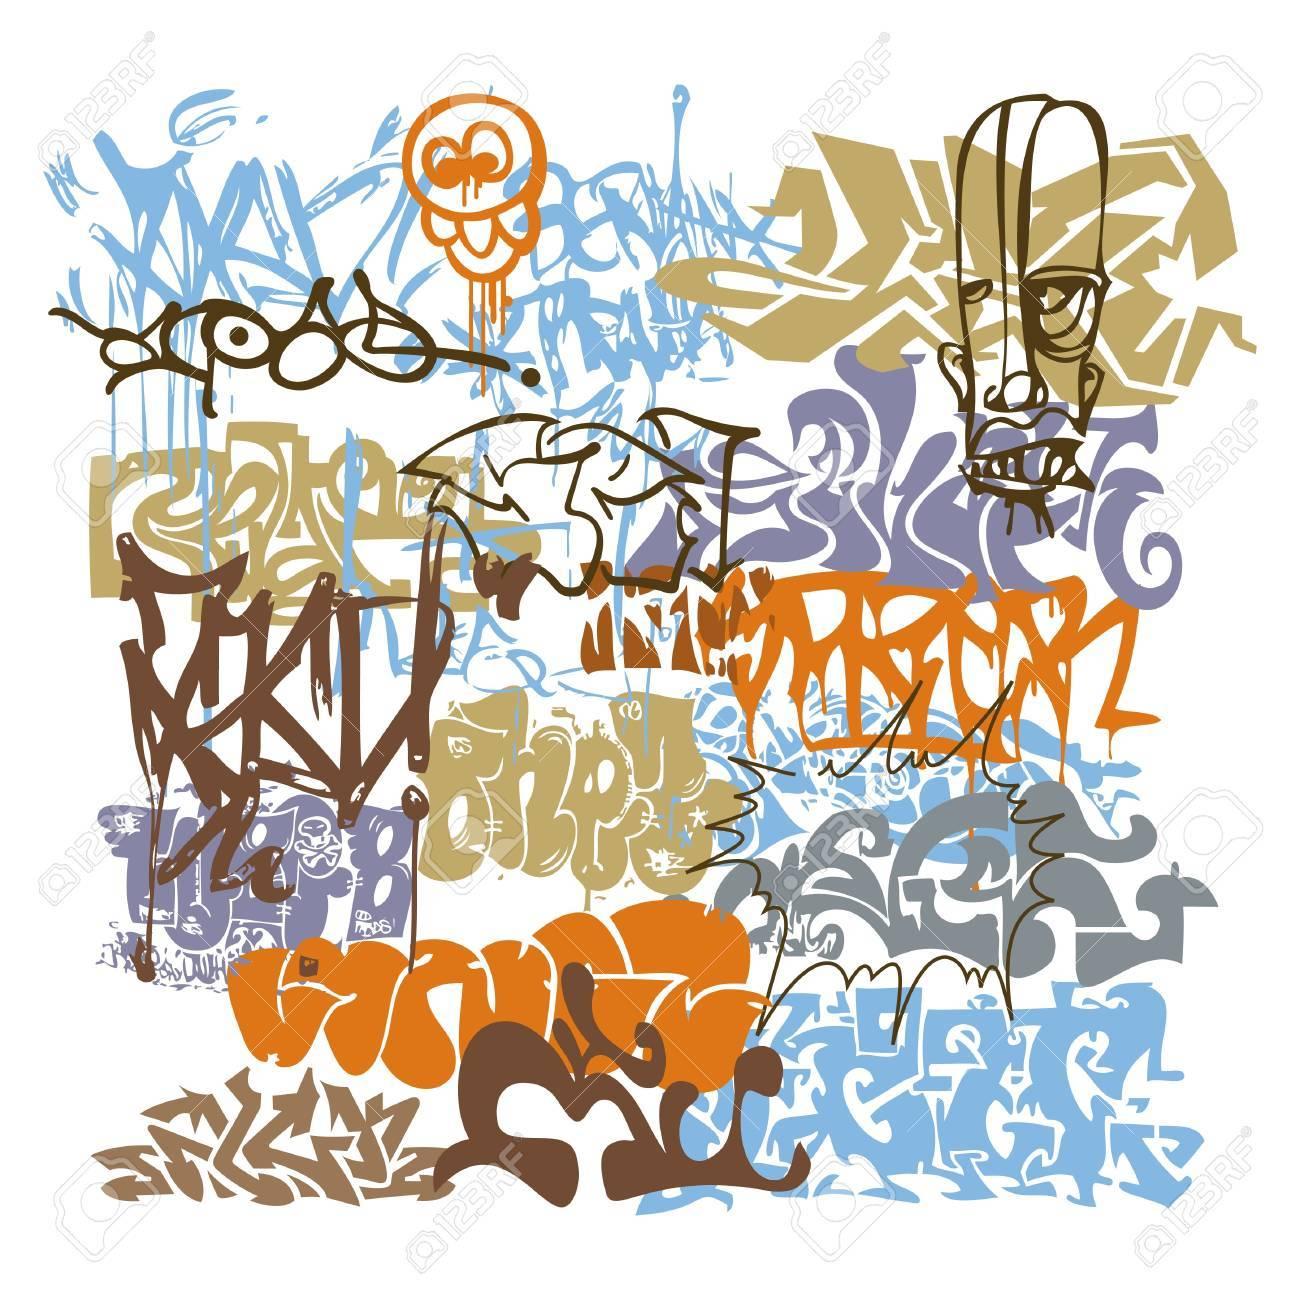 Grafitti Tag Urban Art Stock Vector - 17569395